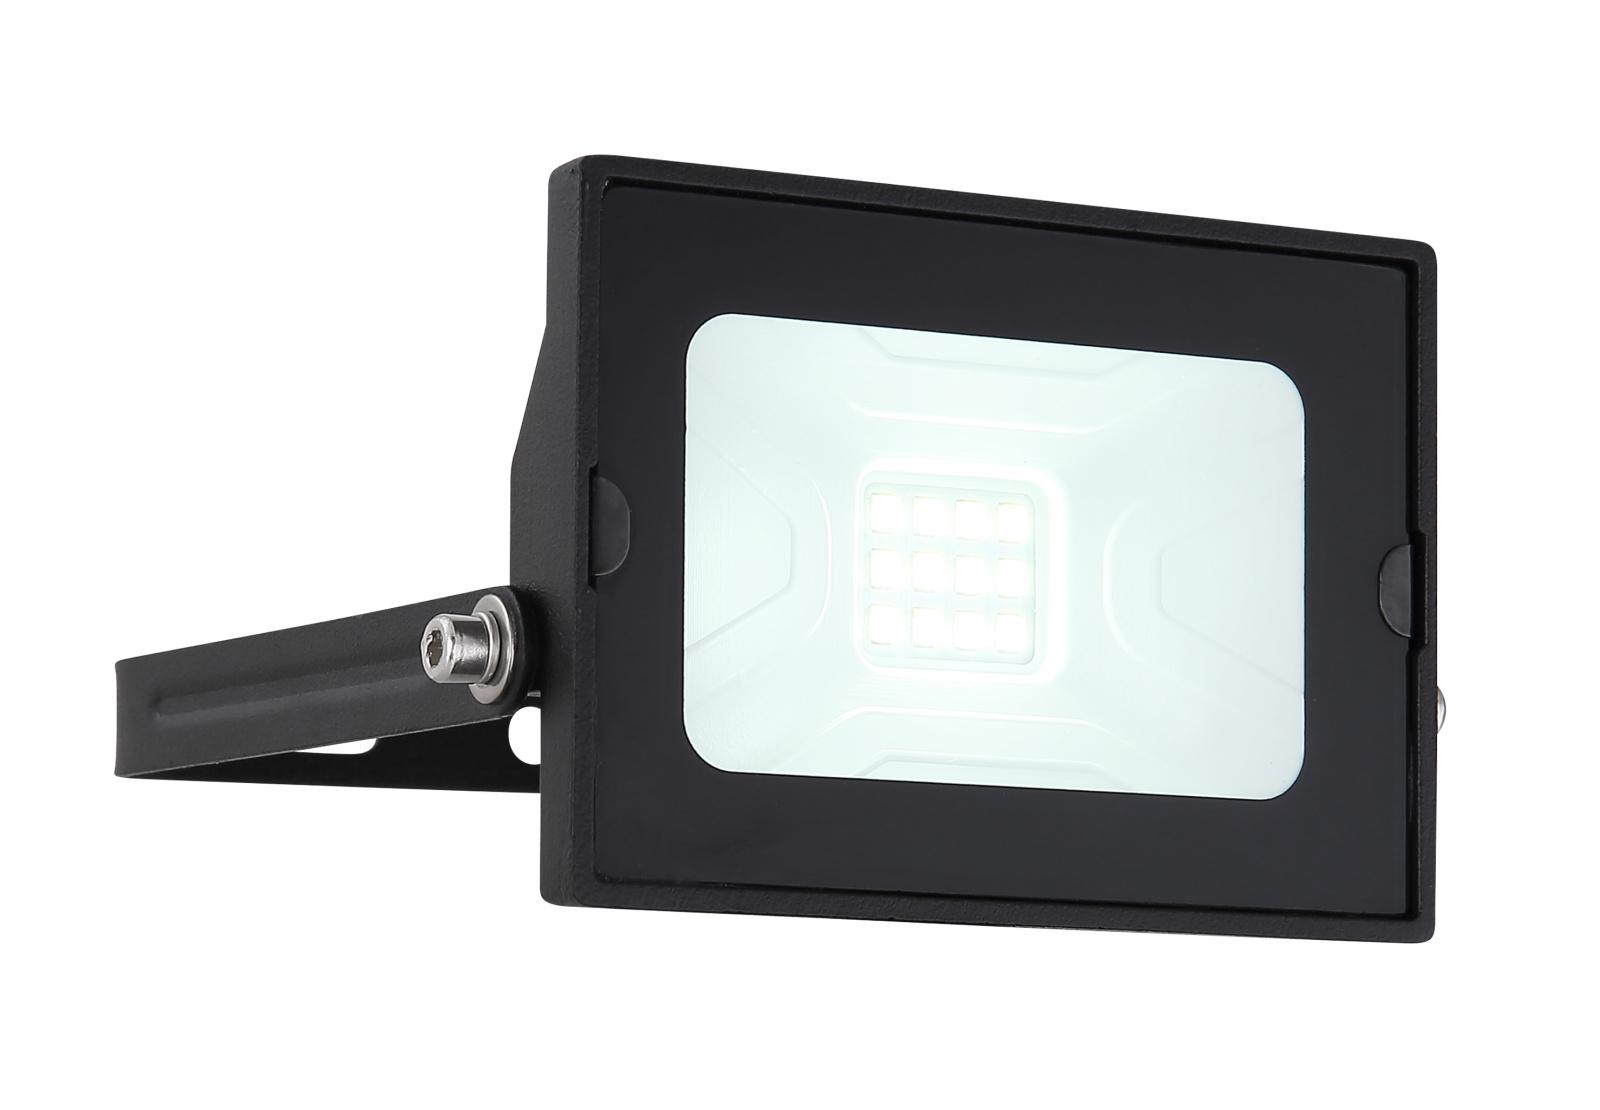 Kültéri reflektor fekete alumínium, üveg búrával. IP65 inkl. 1xLED 10W 230V, 750lm, 6000K